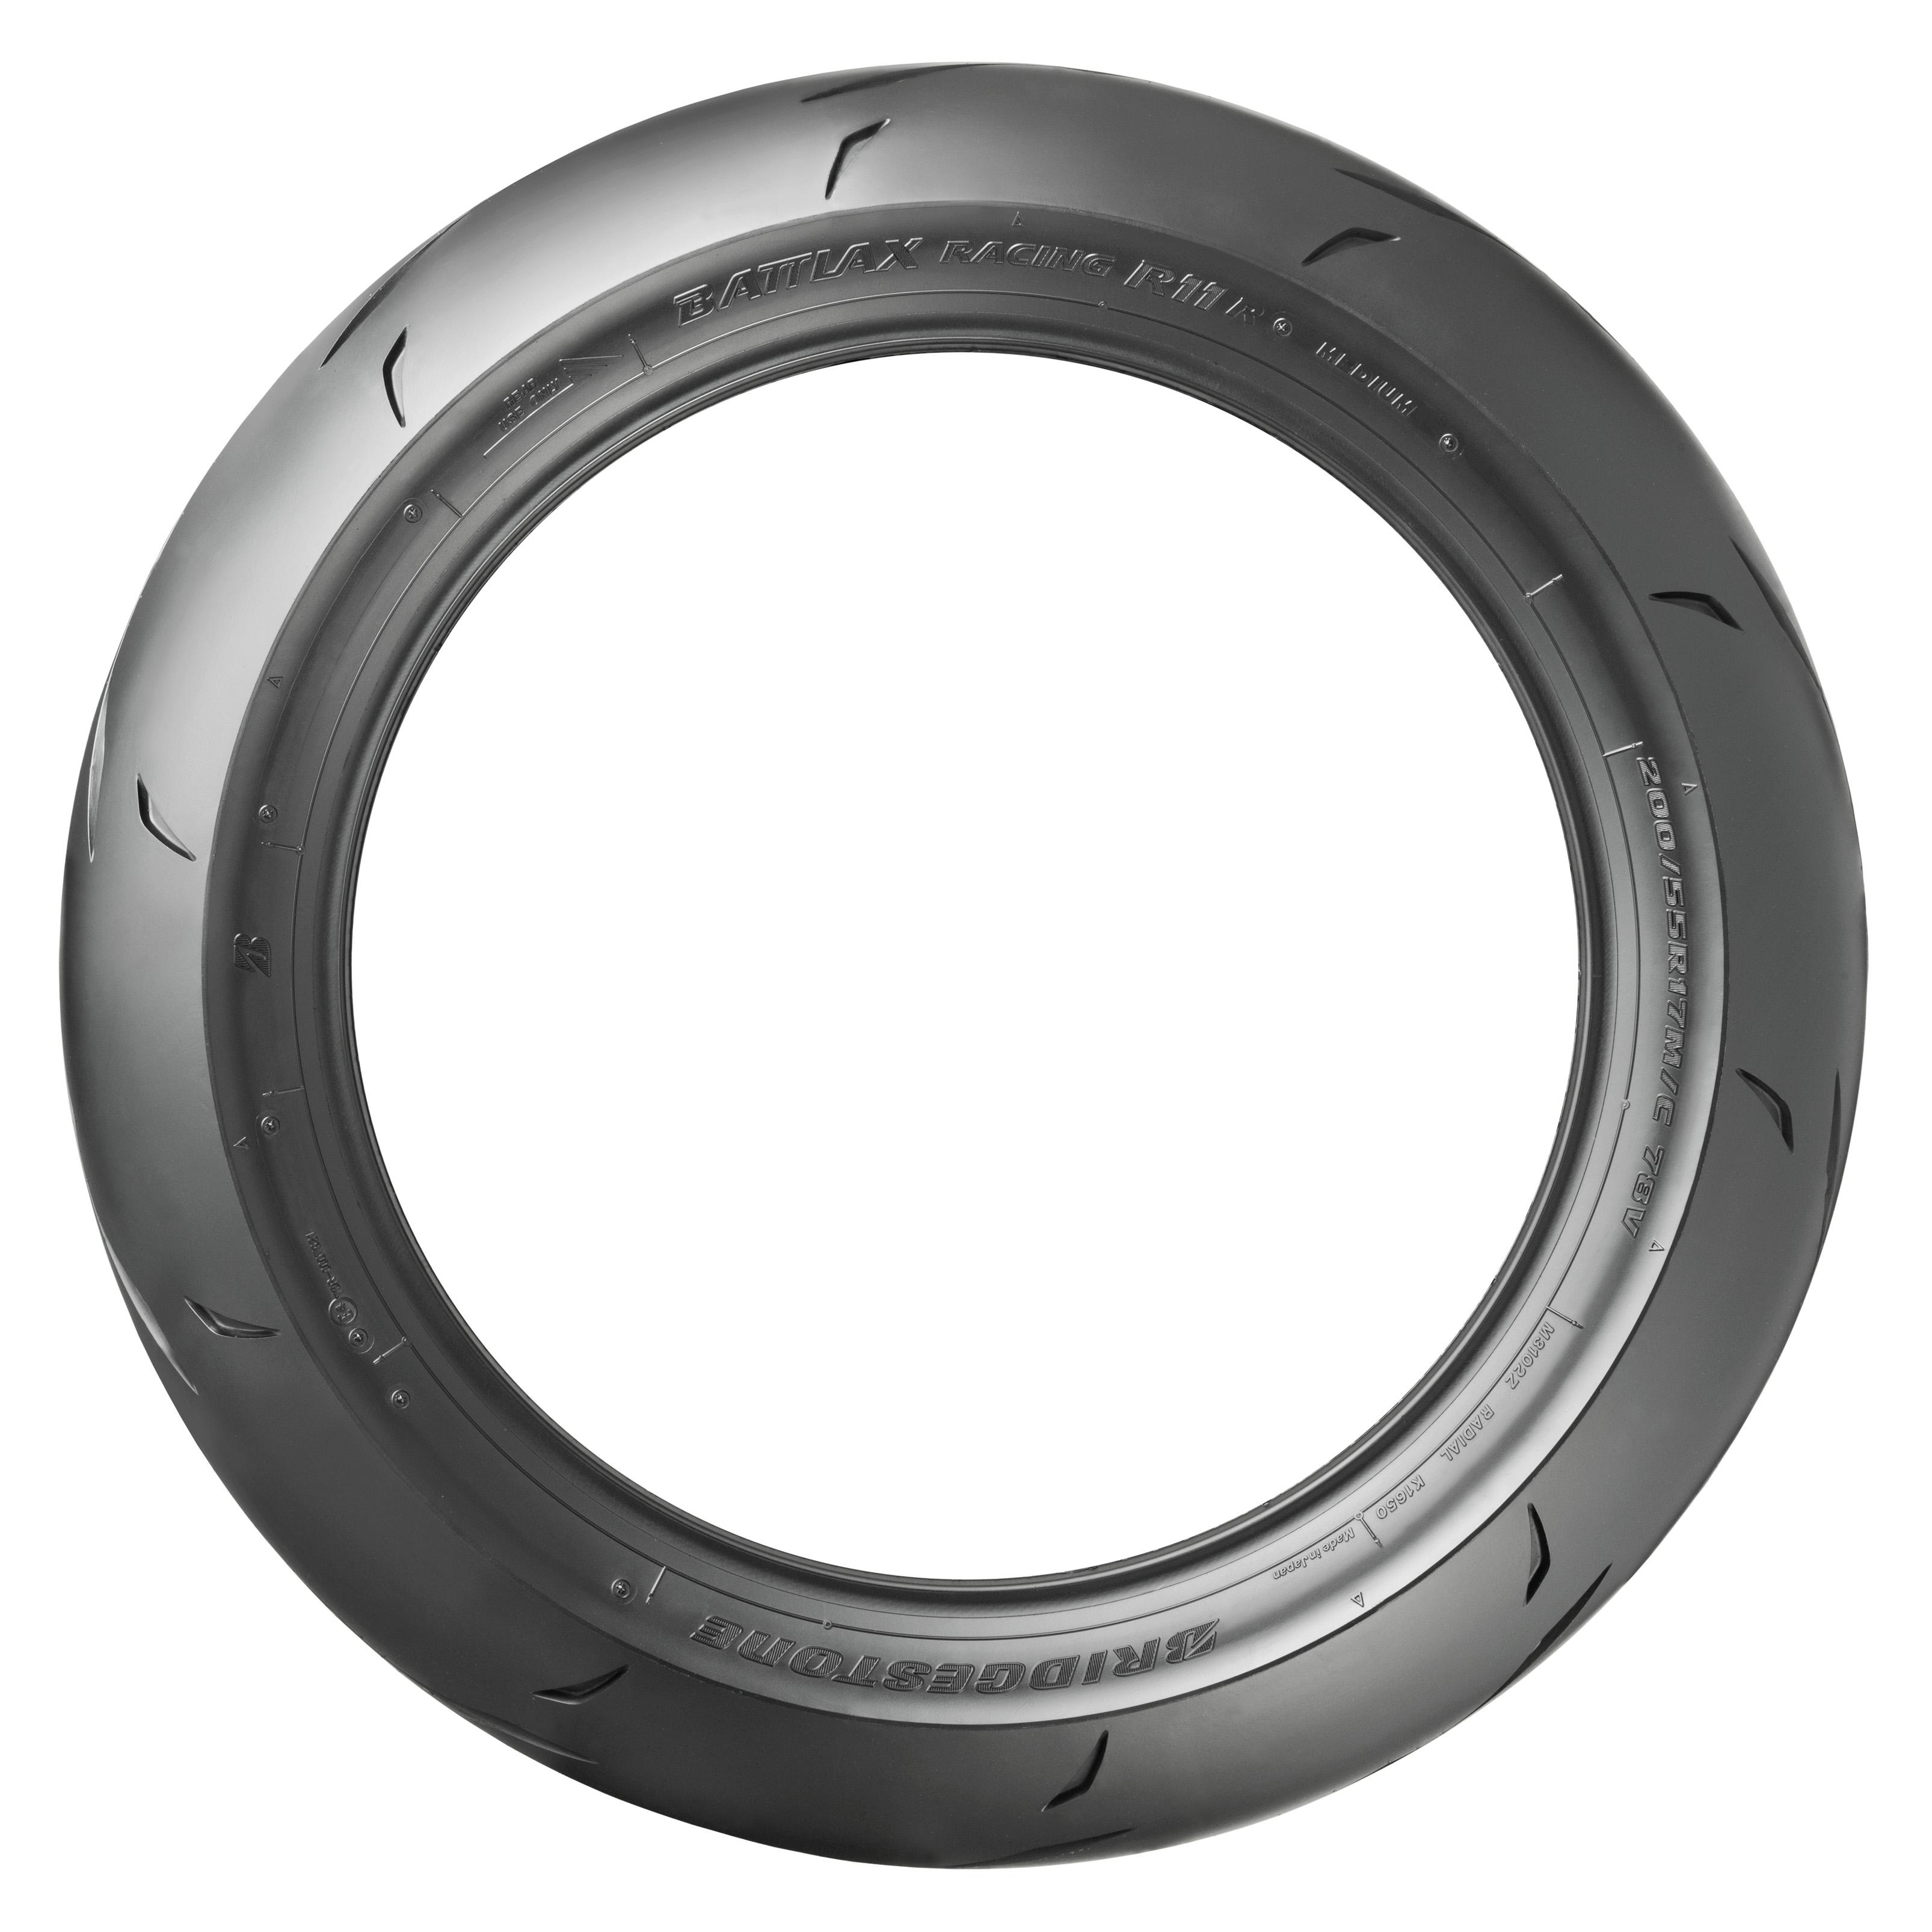 Bridgestone Battlax R11 200/55VR17 (78V) Race Soft Rear Tyre